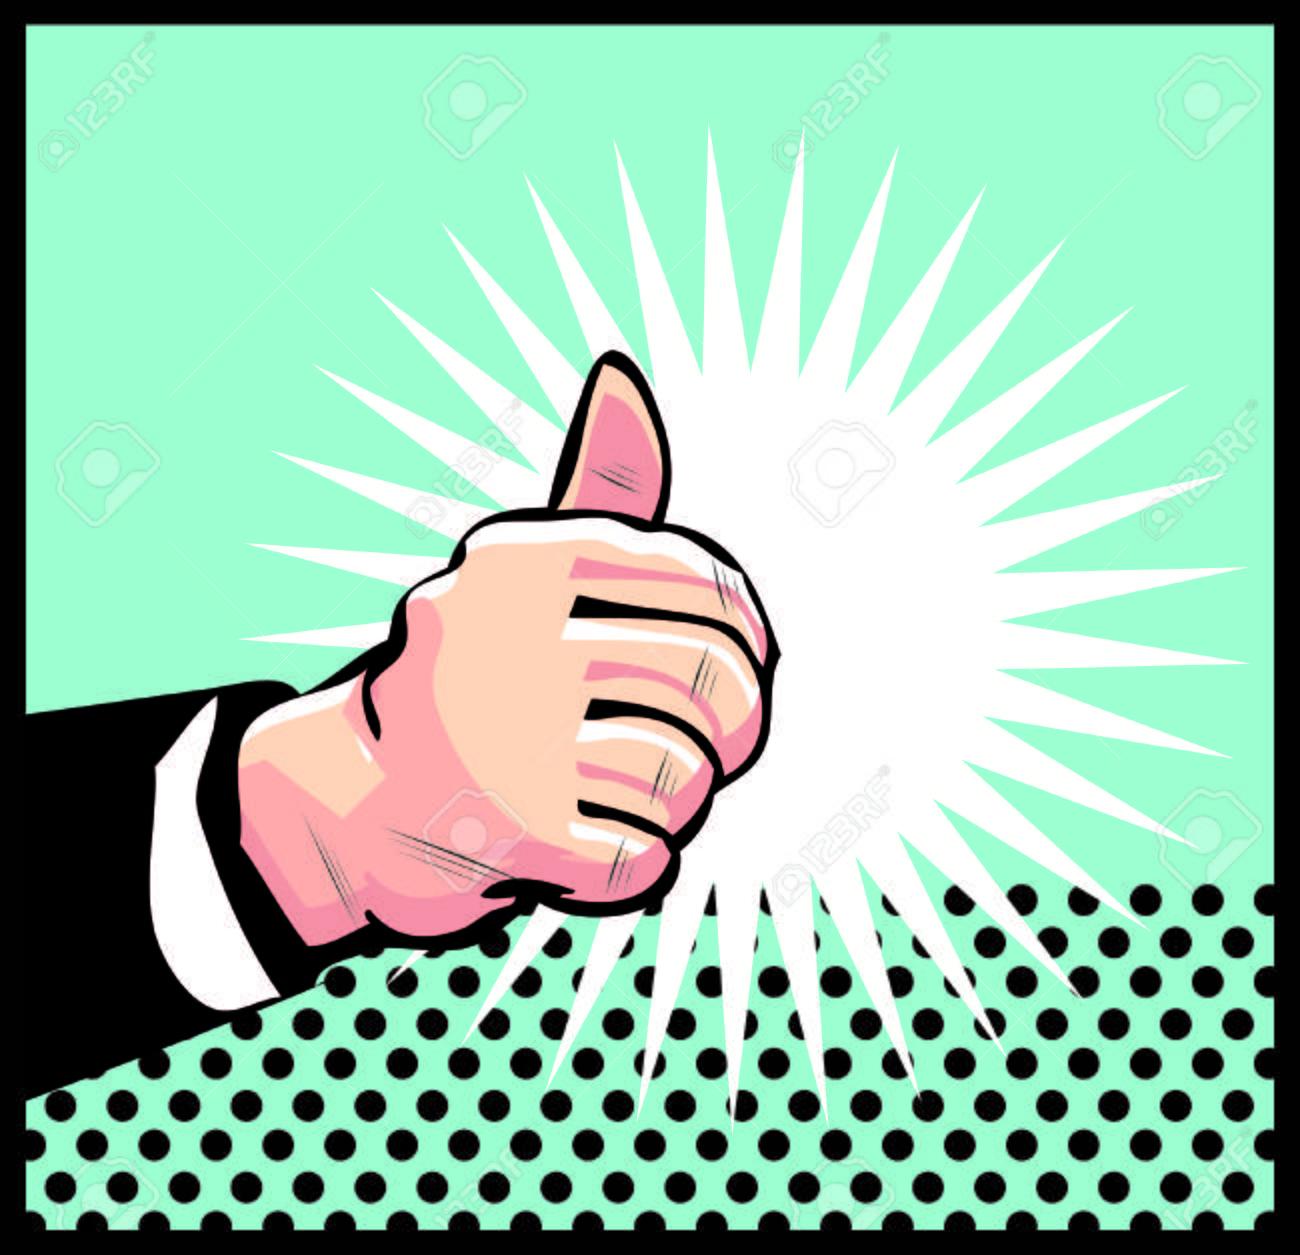 Thumb Up Retro business icon illustration pop art style Stock Photo - 26498315